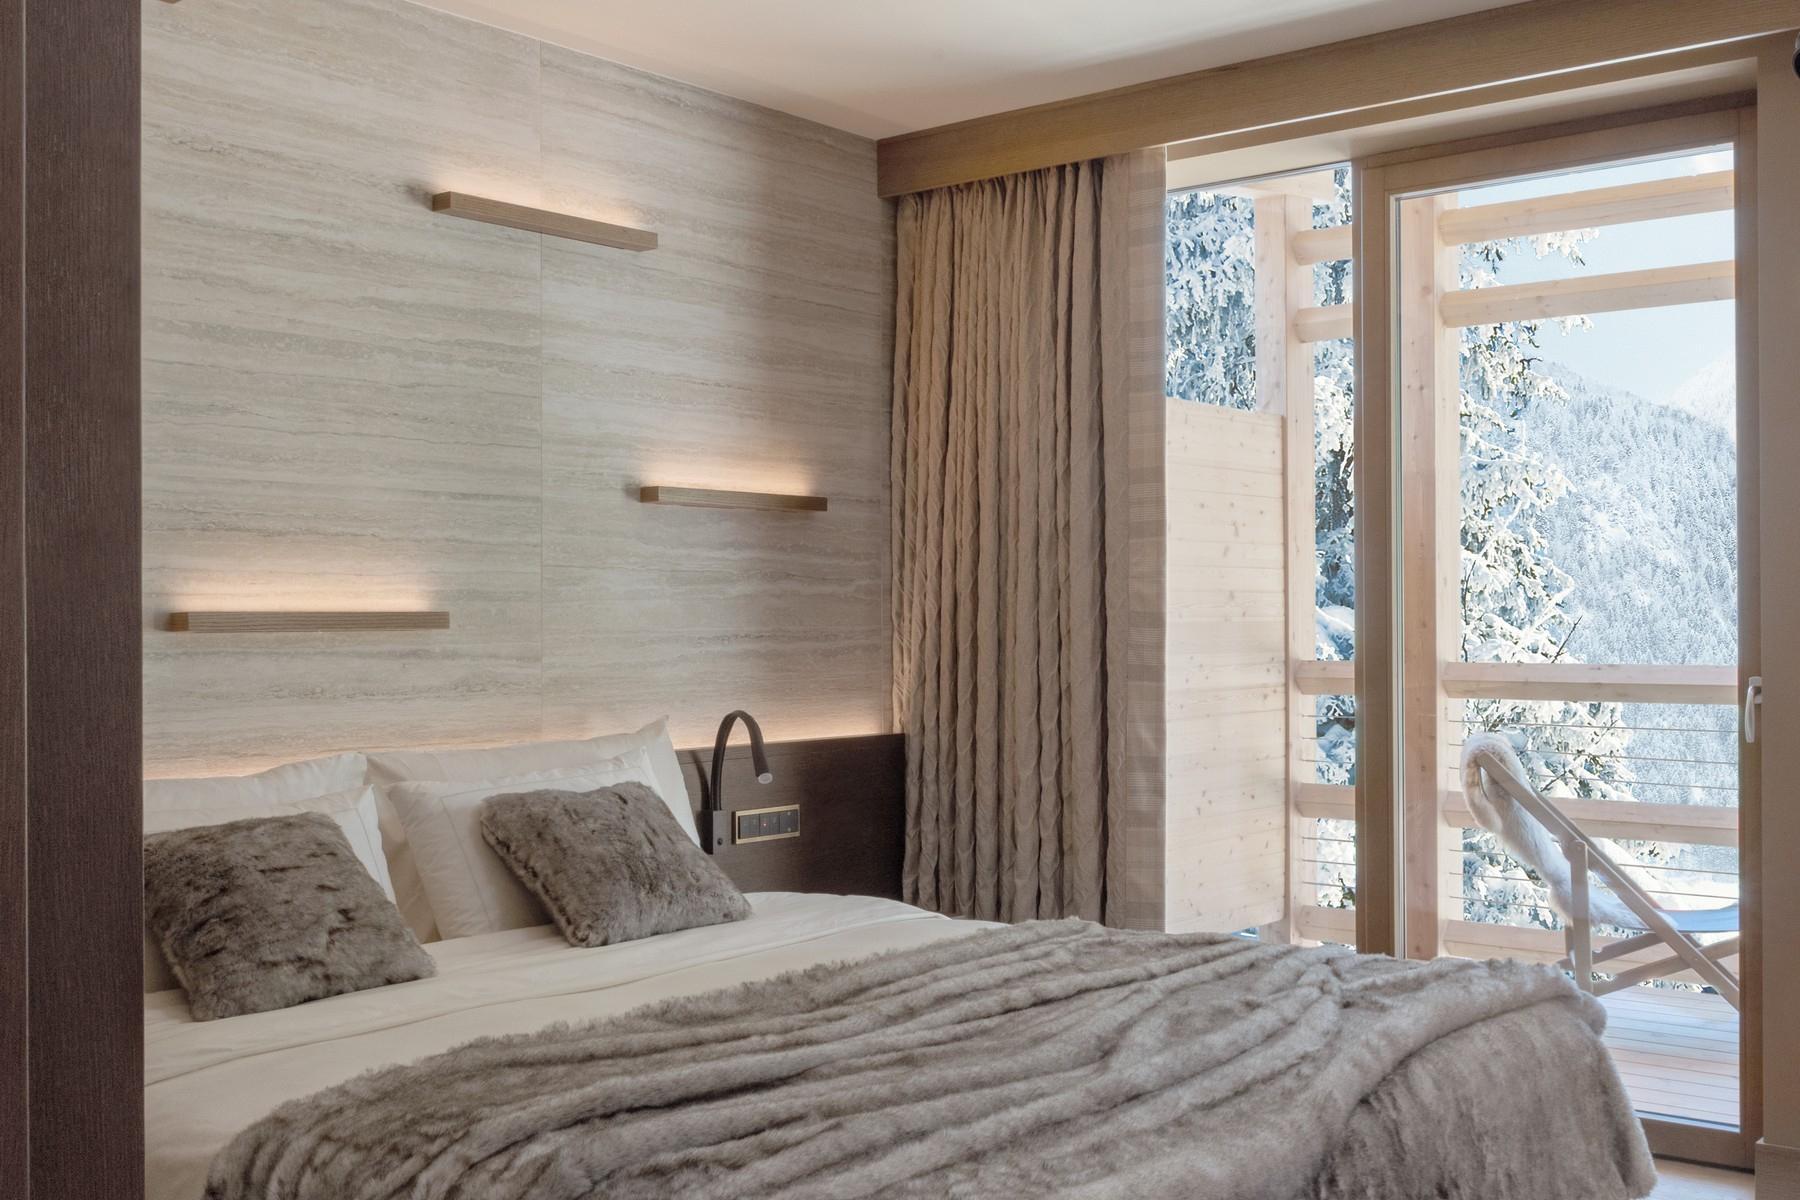 Splendide residenze di lusso sulle Dolomiti - 29